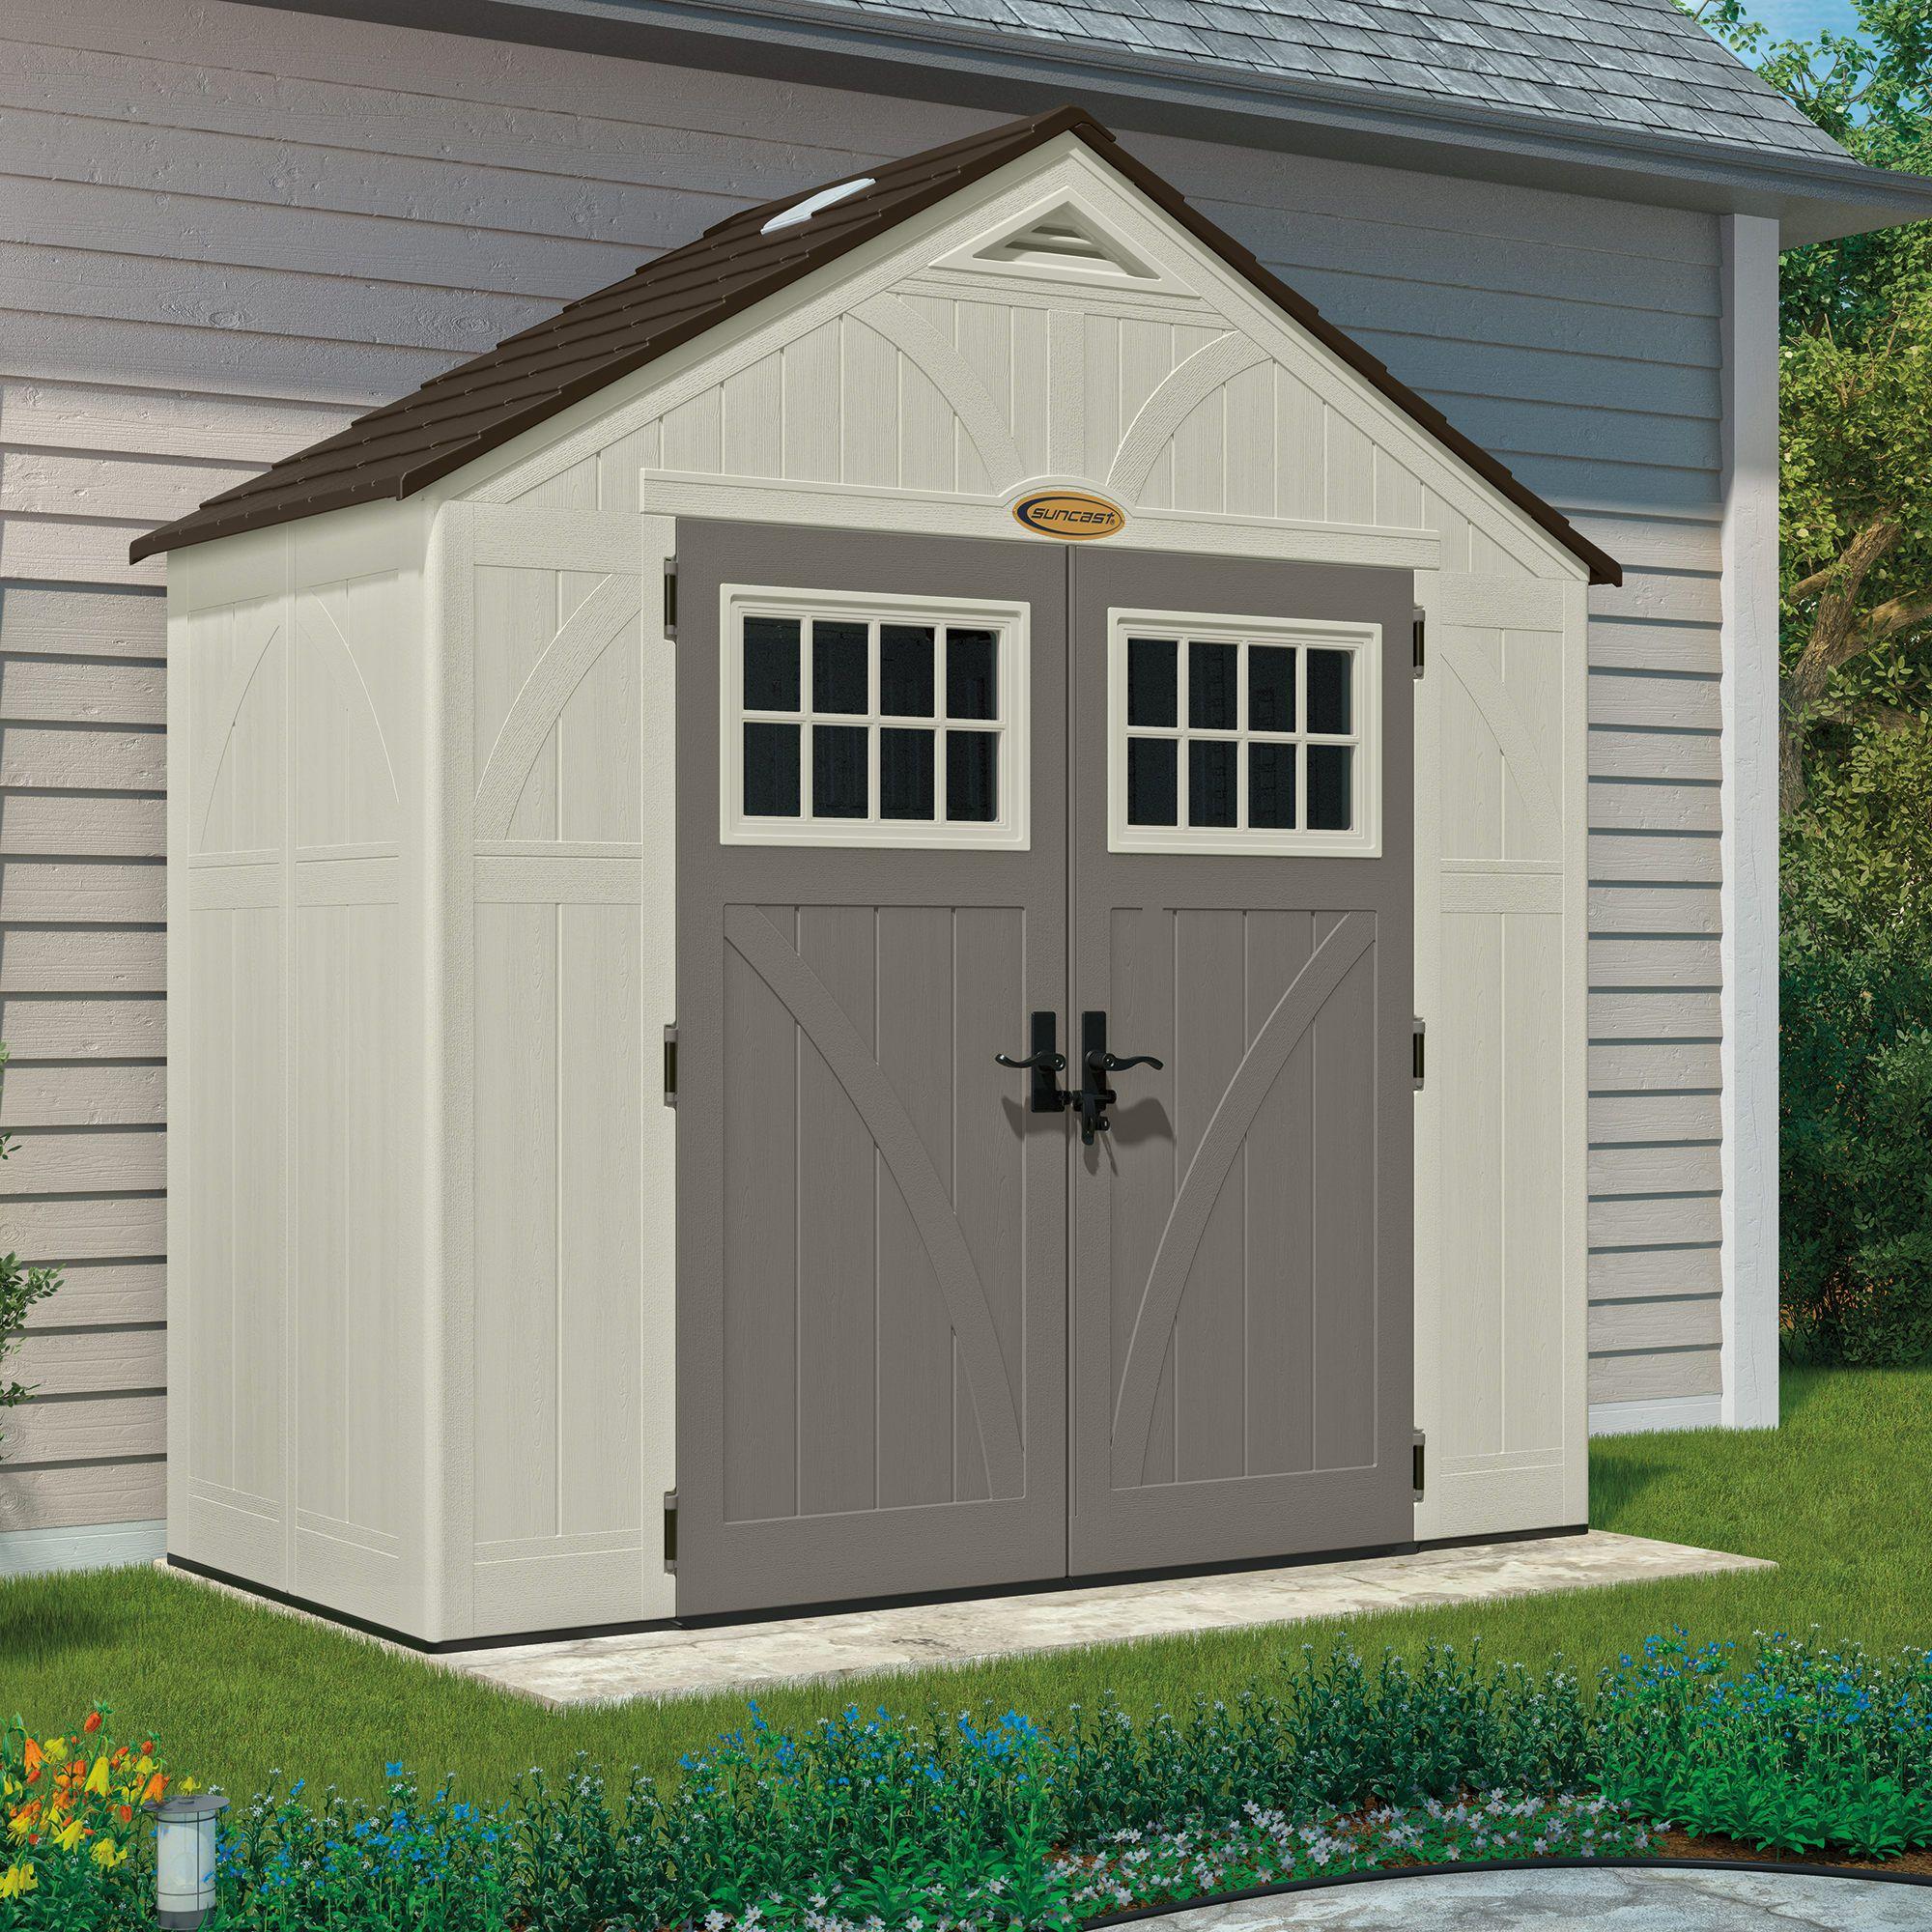 suncast 8 x 4 storage shed cabana shed storage shed storage